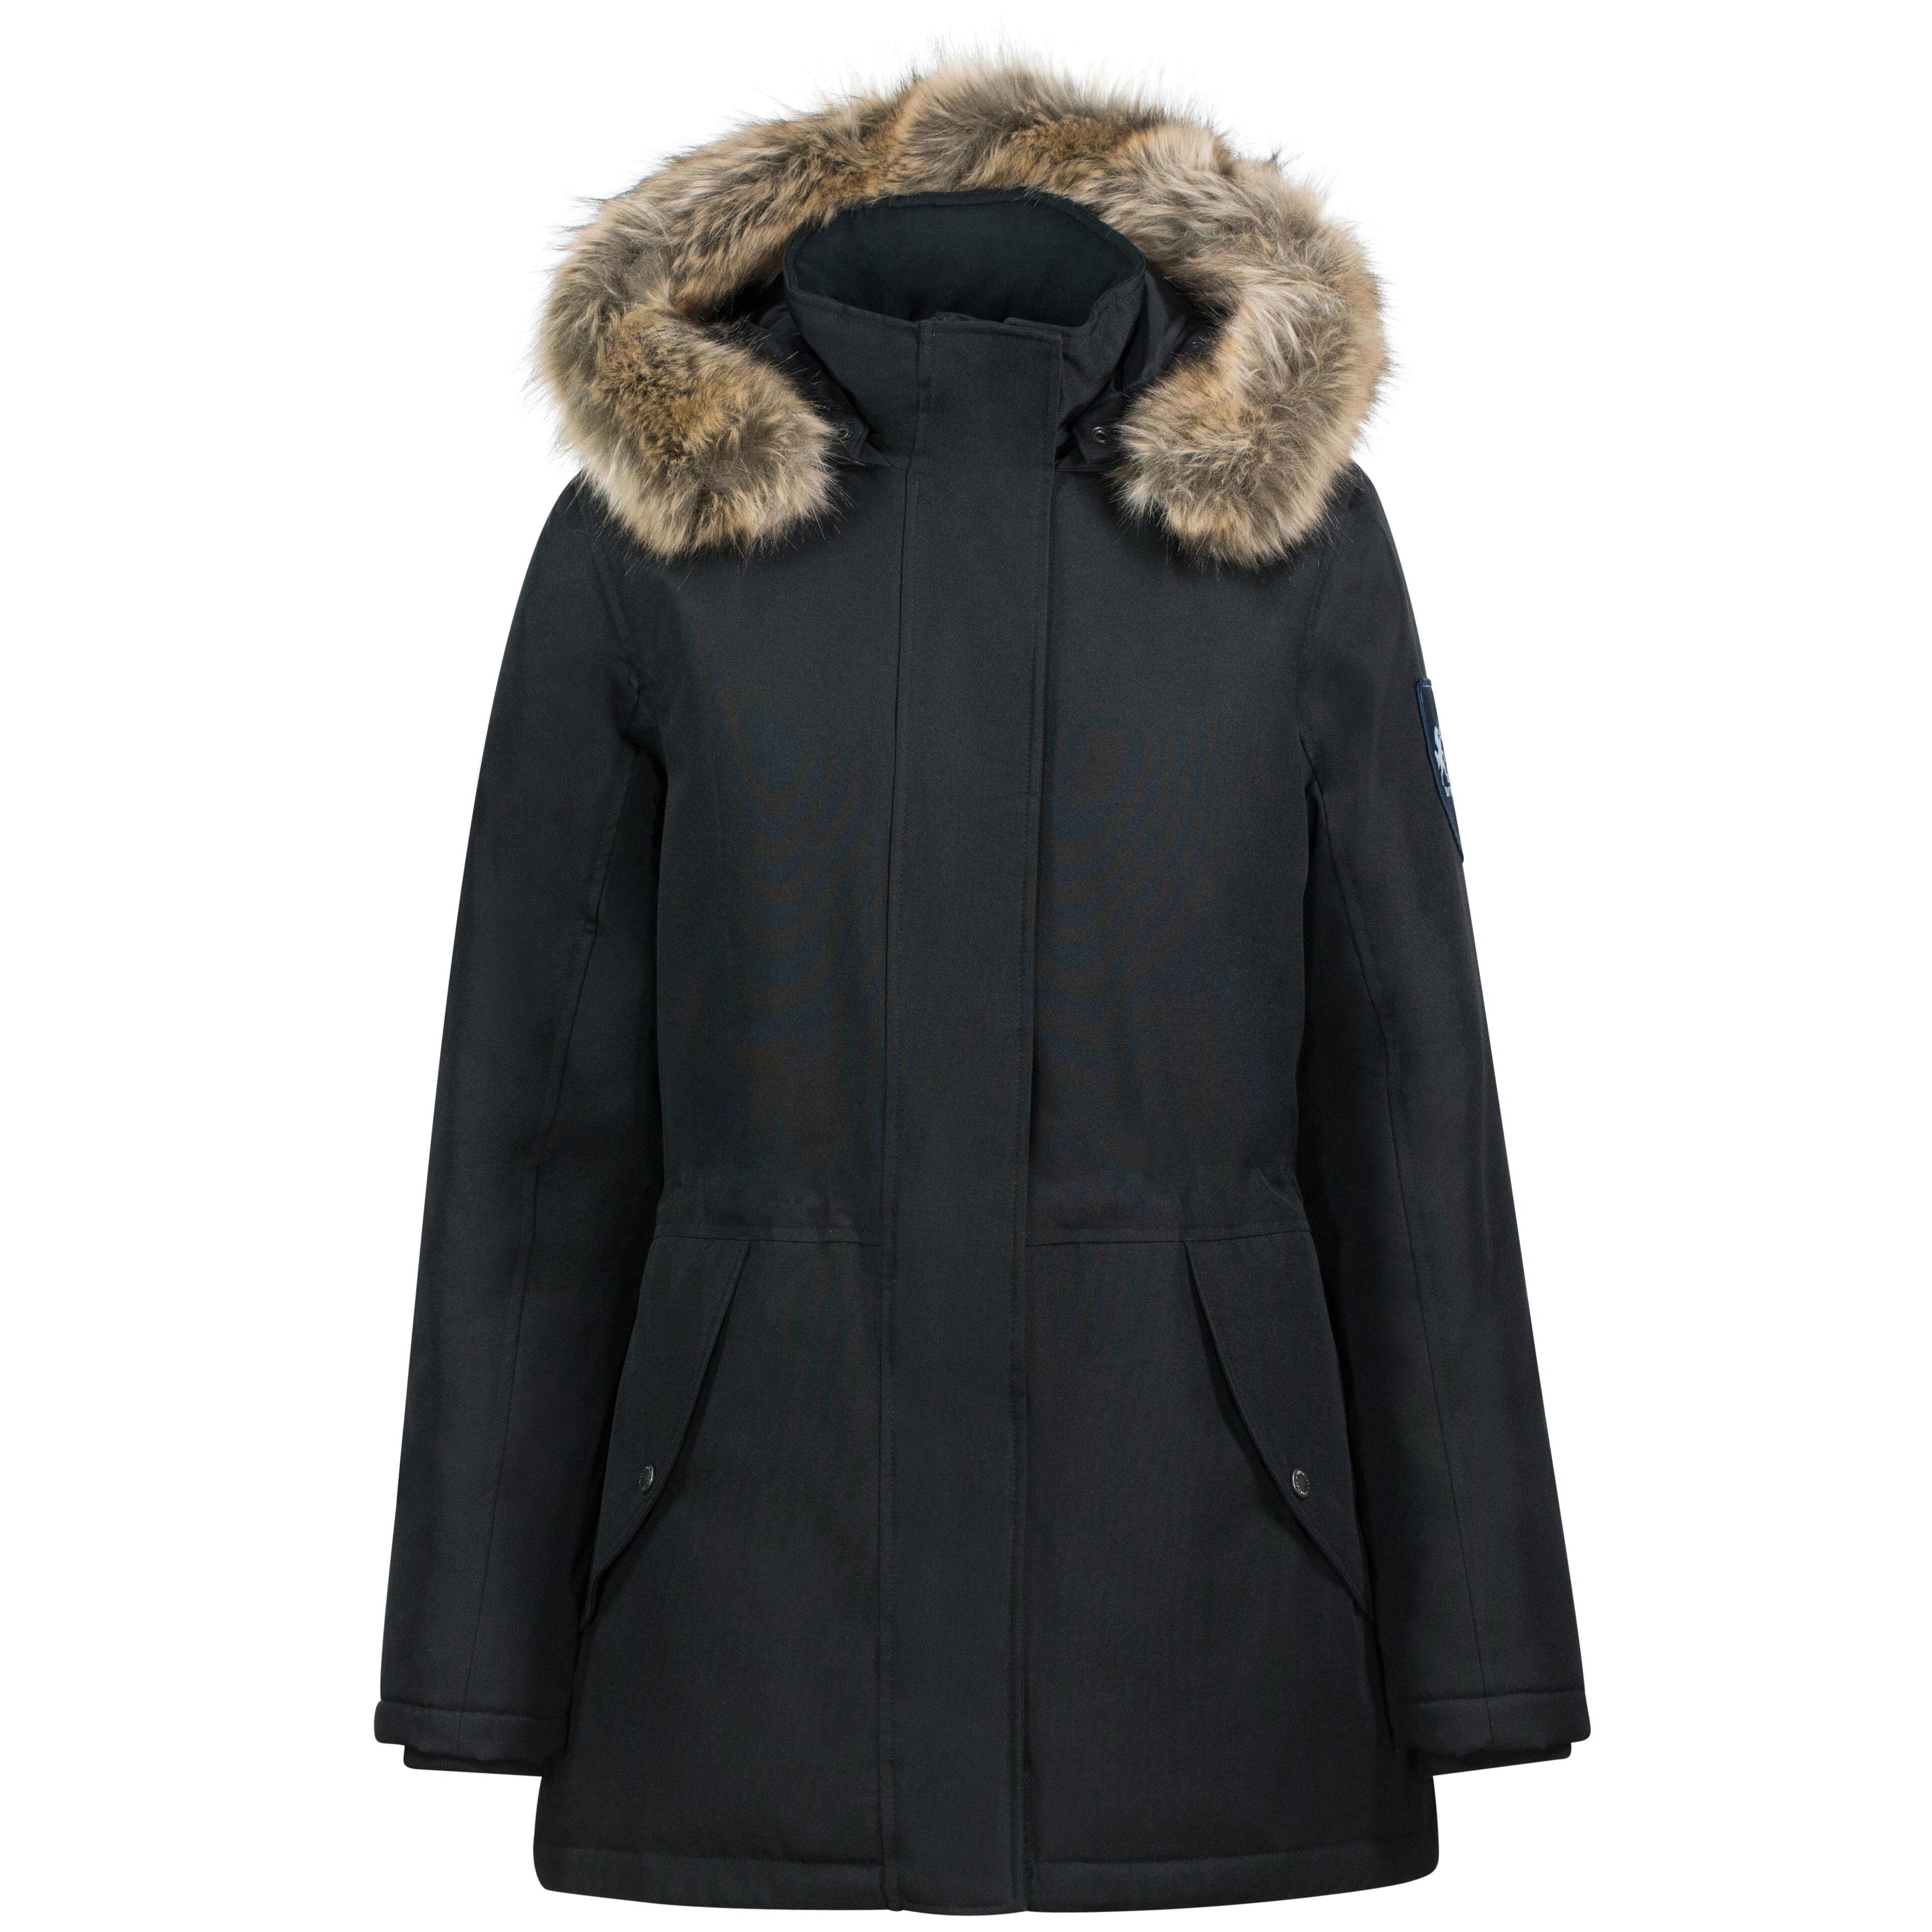 B Vertigo Estella lang jakke, dame | Horze